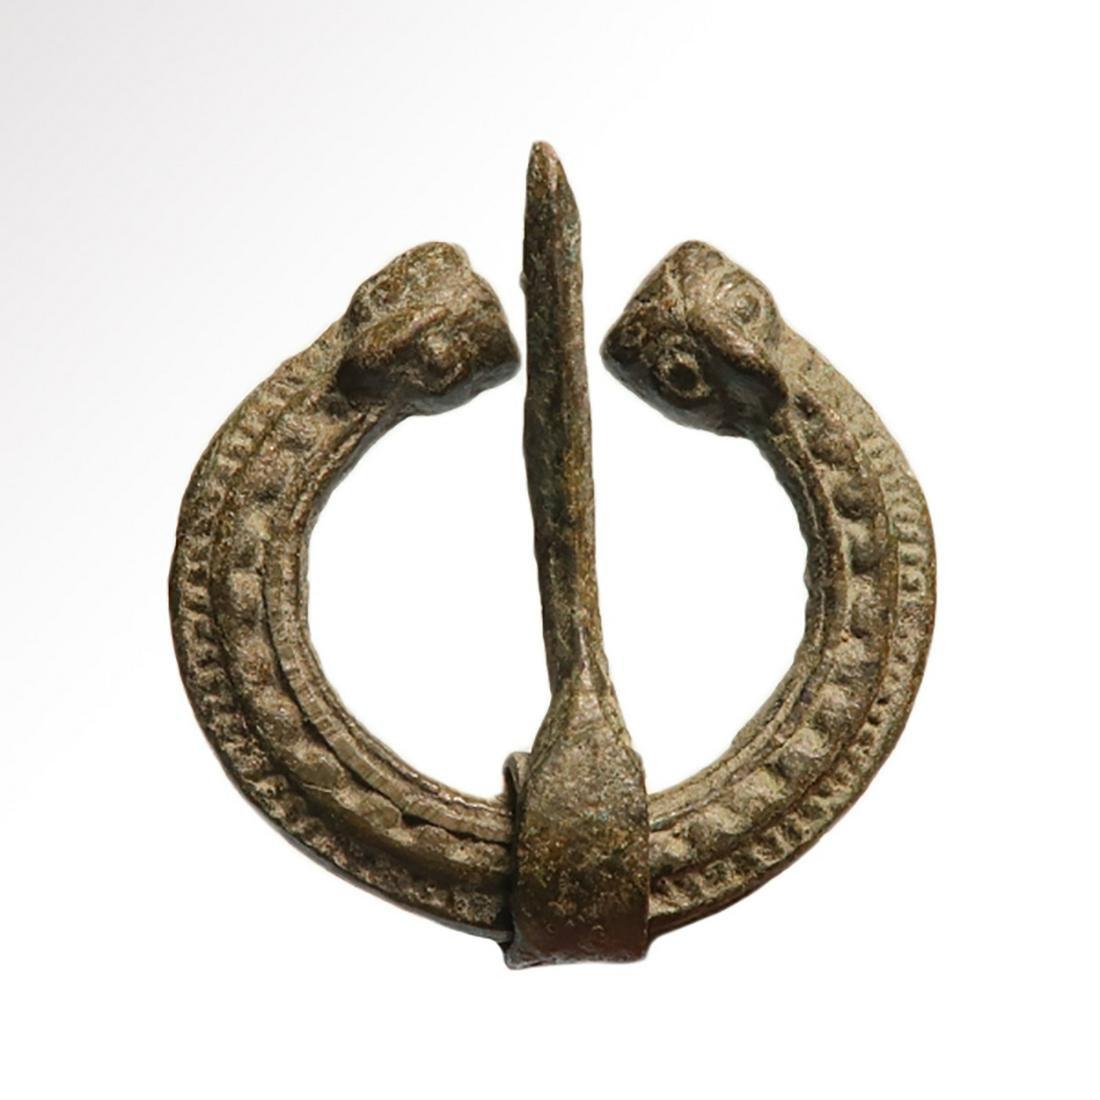 Viking Bronze Brooch, Eagles Heads, c. 9th-10th Century